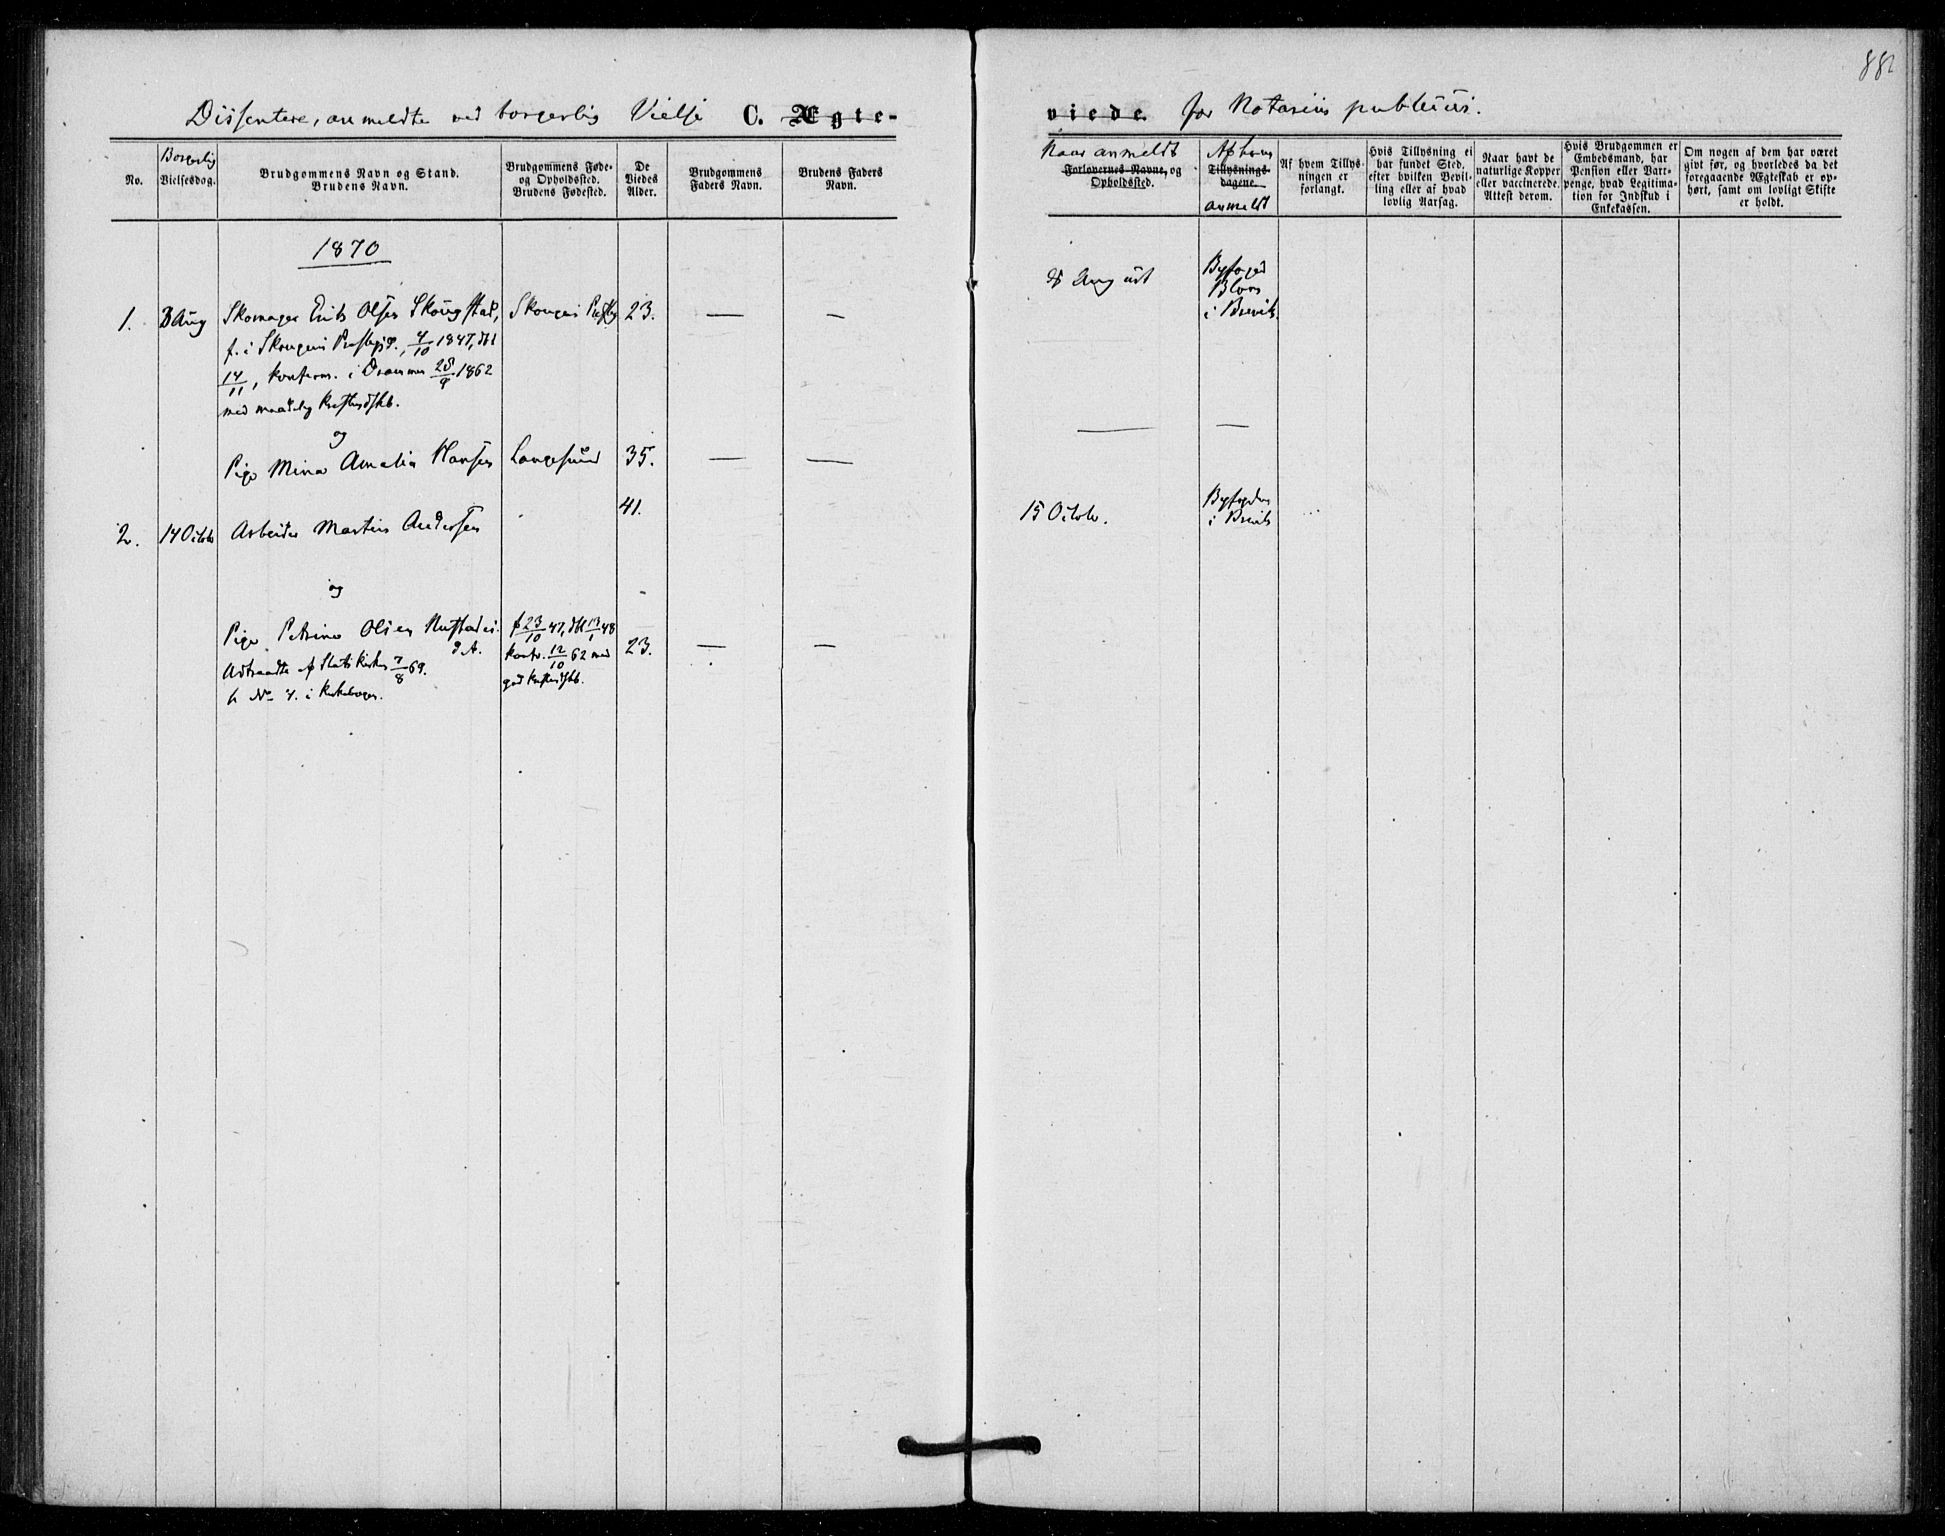 SAKO, Langesund kirkebøker, F/Fa/L0001: Ministerialbok nr. 1, 1870-1877, s. 88